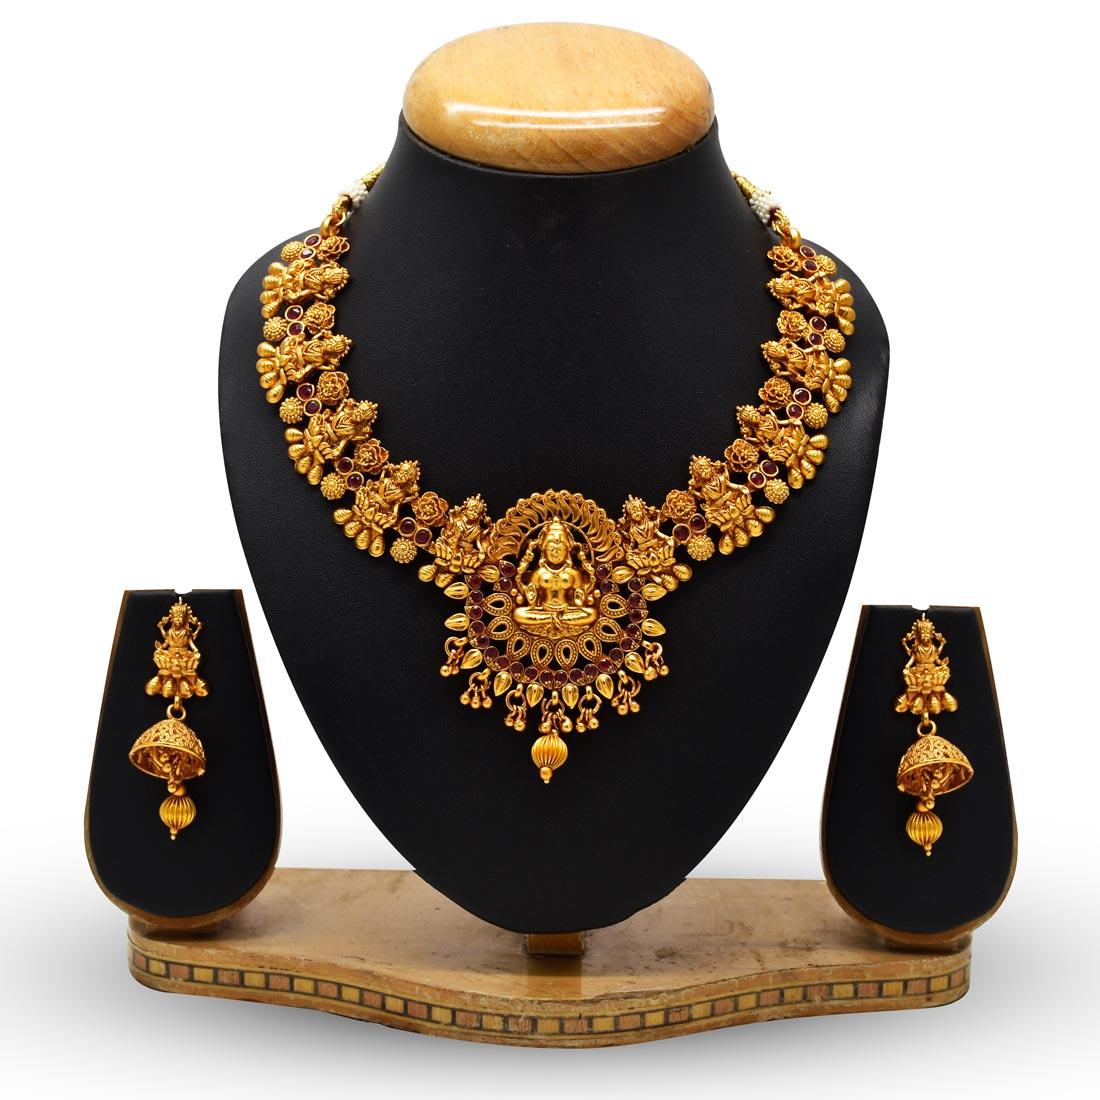 Kollam Supreme Premium Fashion Jewellery Buy Classic Chettinad Kemp Lakshmi Necklace Set Online Kollamsupreme